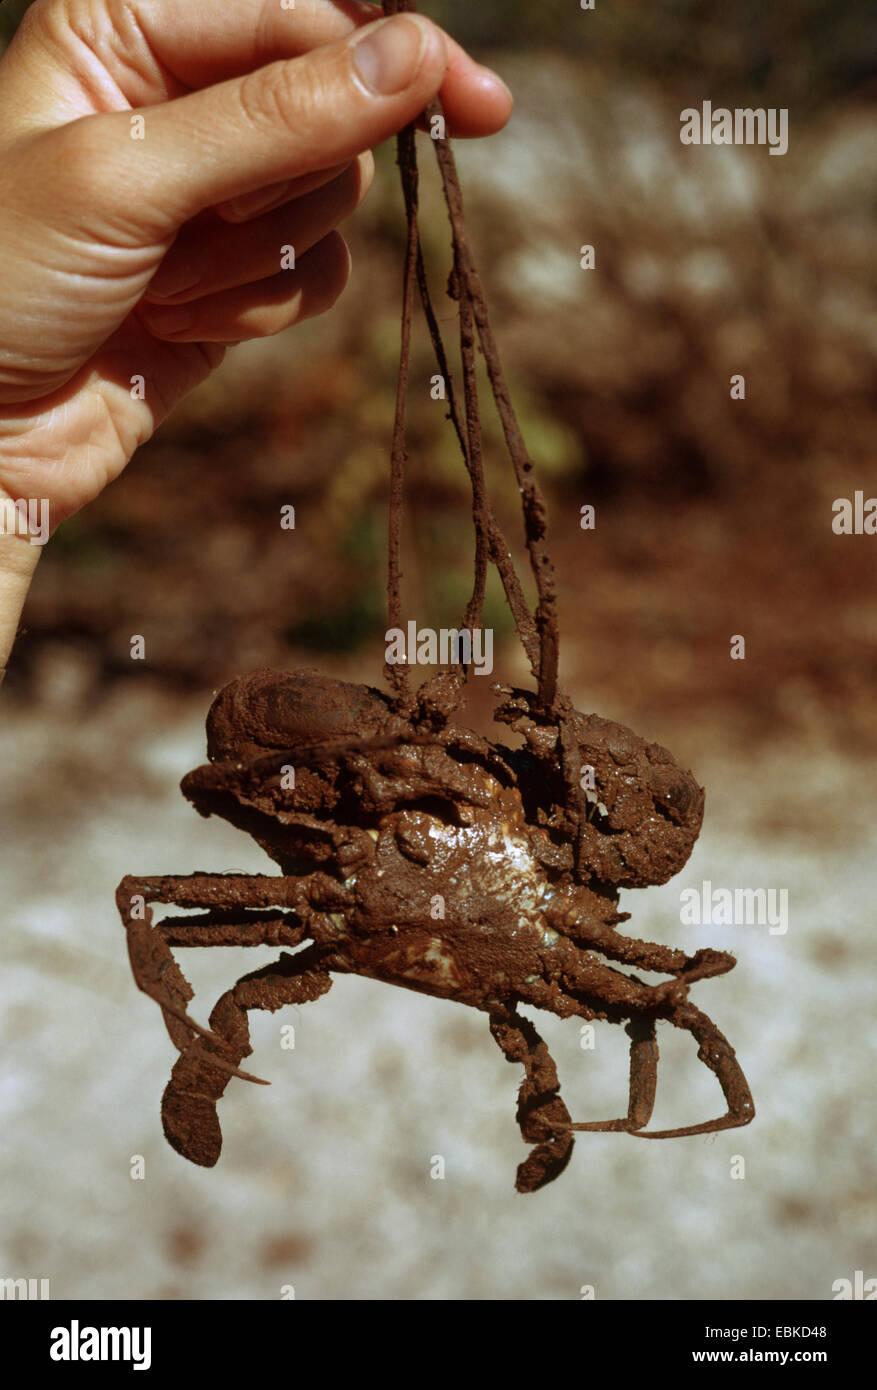 serrated mud swimming crab, serrated mangrove swimming crab, mud crab (Scylla serrata), economically important crab - Stock Image